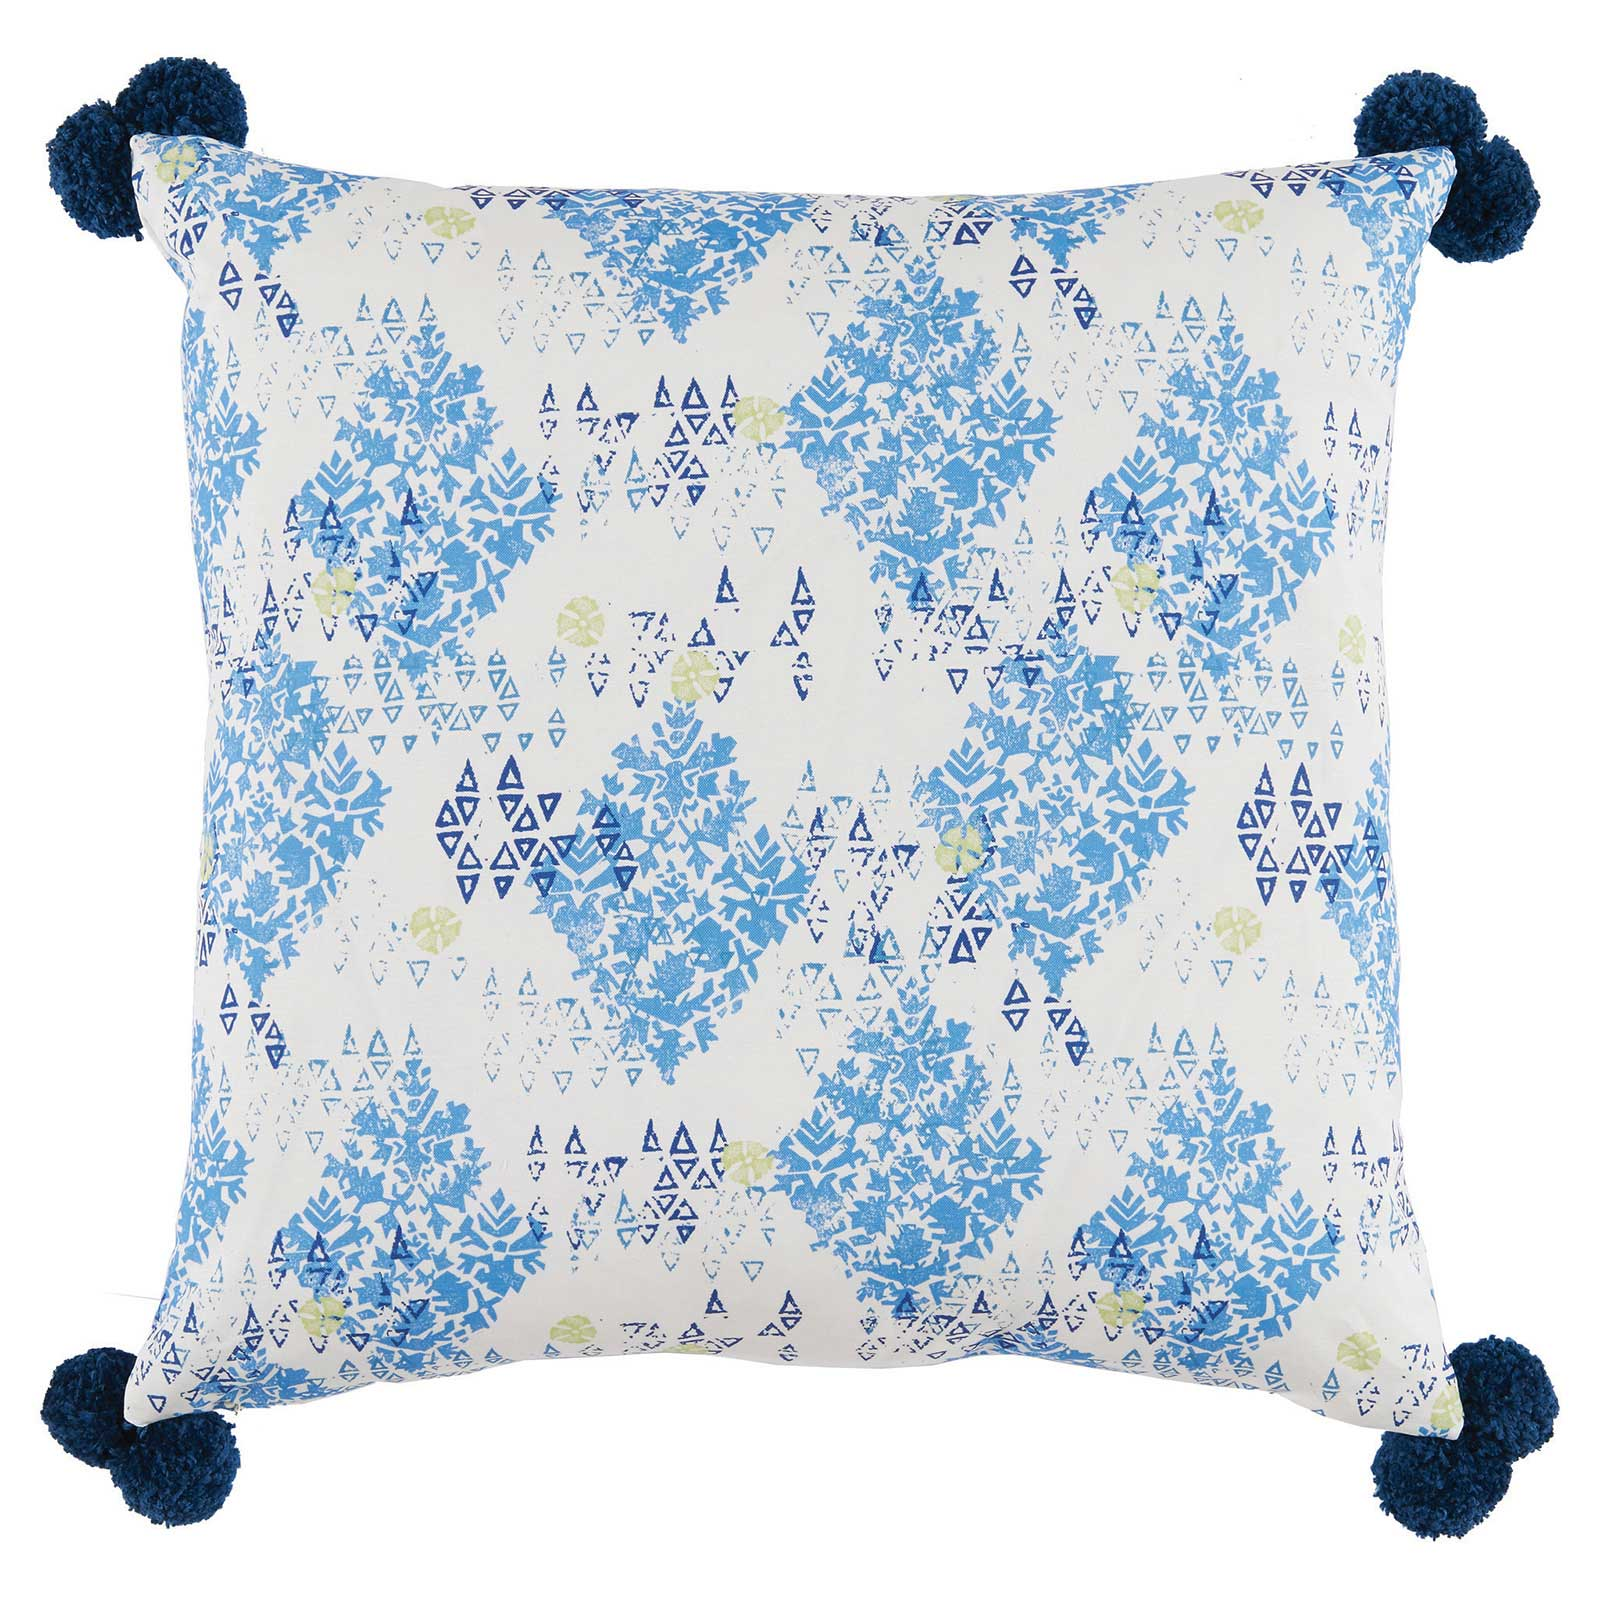 Lottie Modern Block Printed Navy Blue Pom Pom Pillow - 24x24